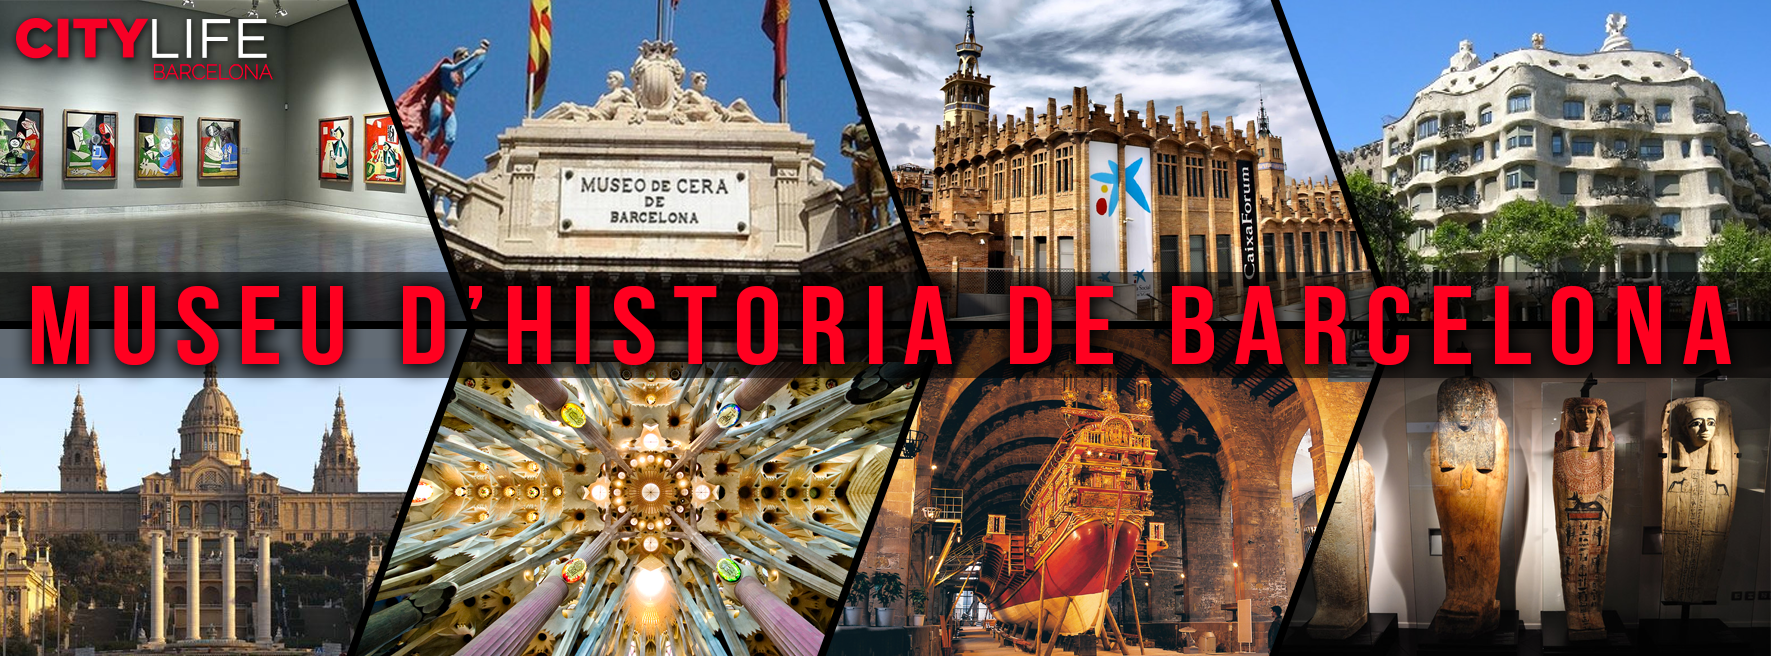 Discover the Museu d'Historia de Barcelona (MUHBA)!